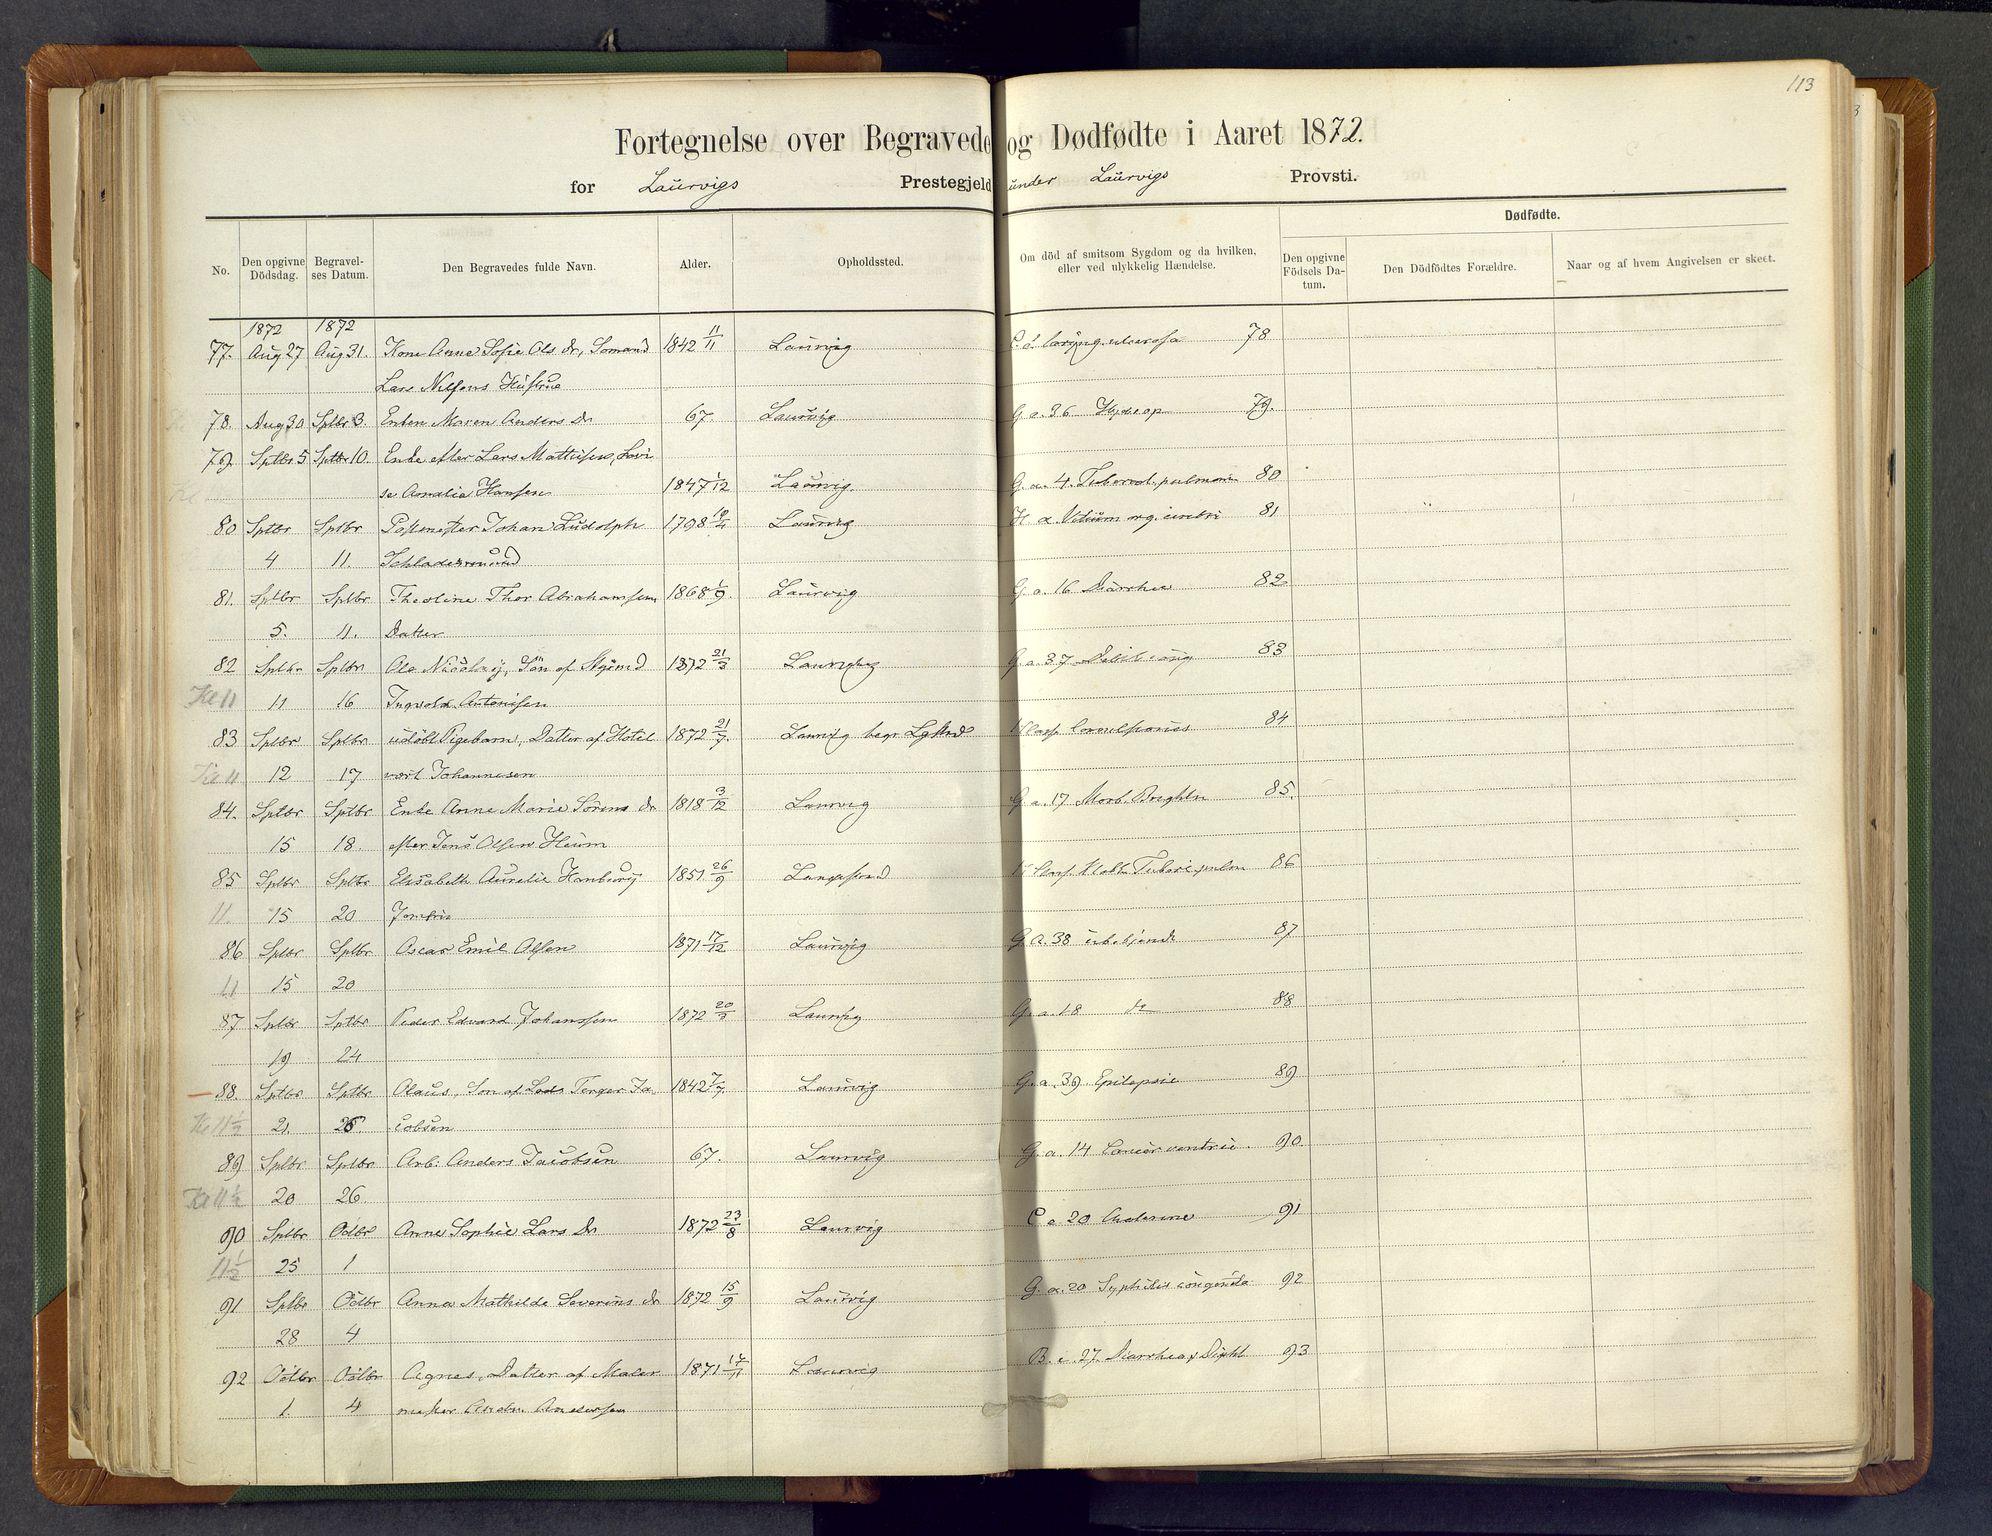 SAKO, Larvik kirkebøker, F/Fa/L0007: Ministerialbok nr. I 7, 1871-1883, s. 113